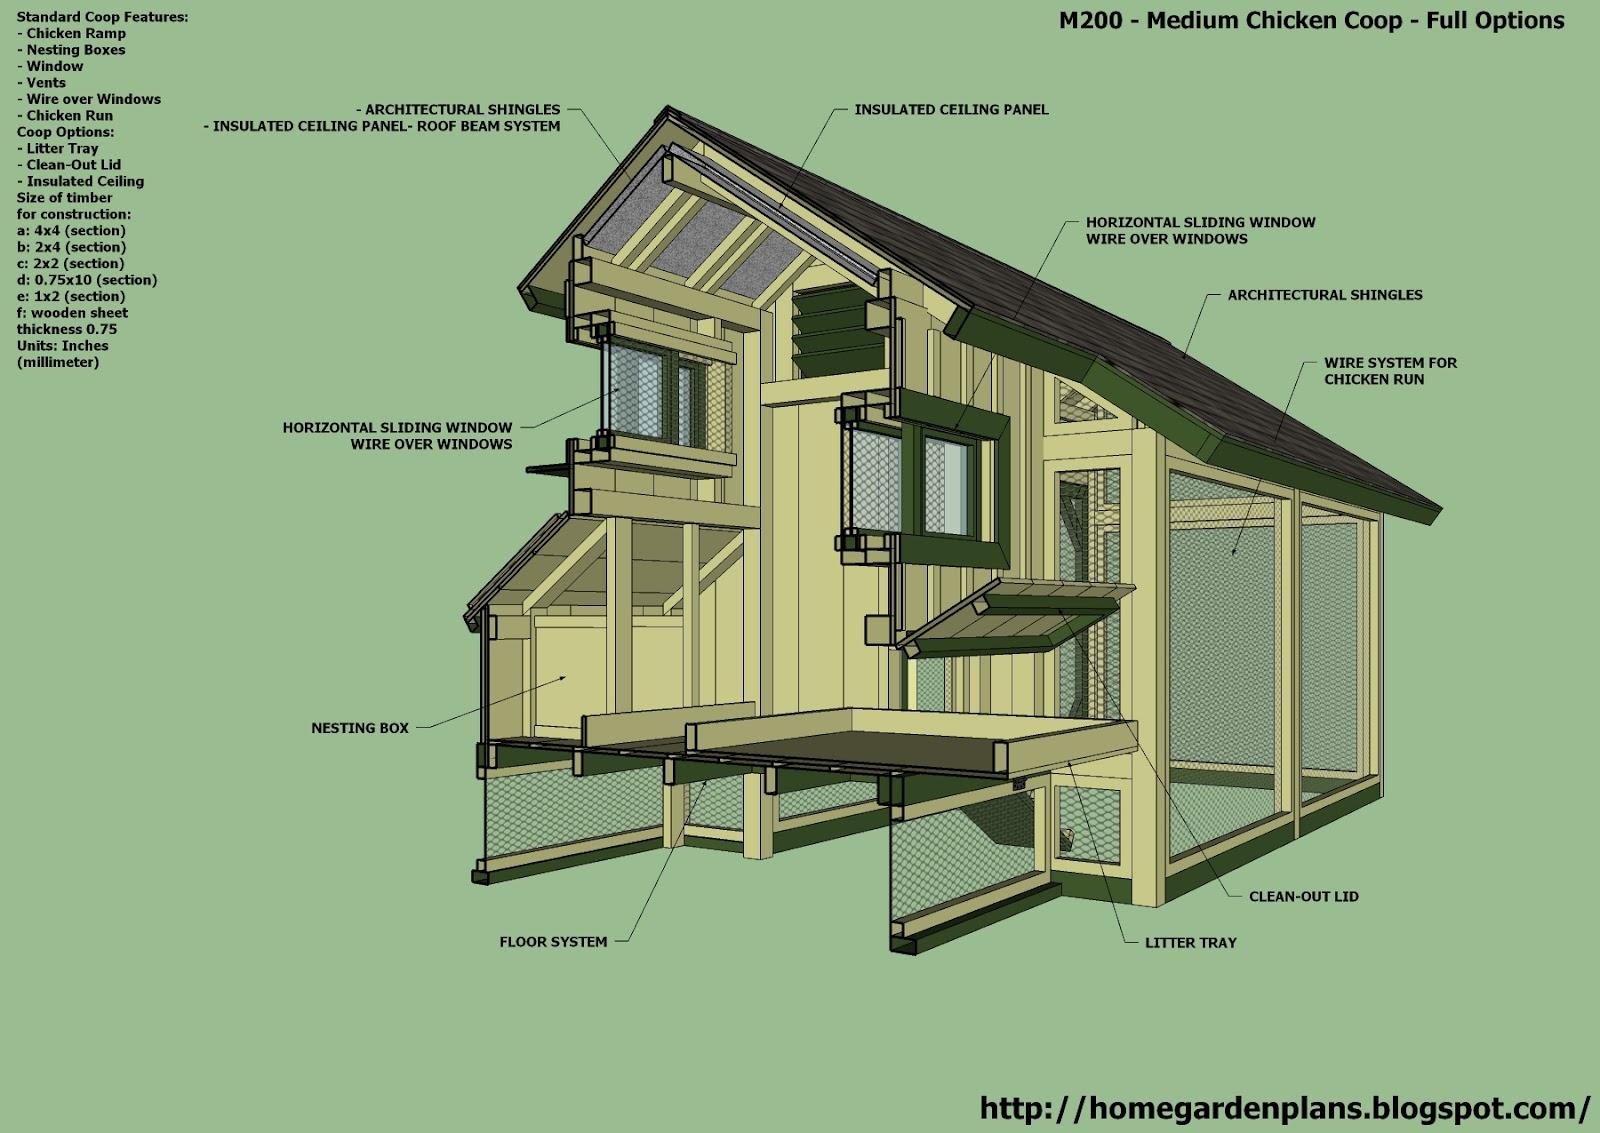 Home garden plans m200 chicken coop plans construction for Mobile hen house plans